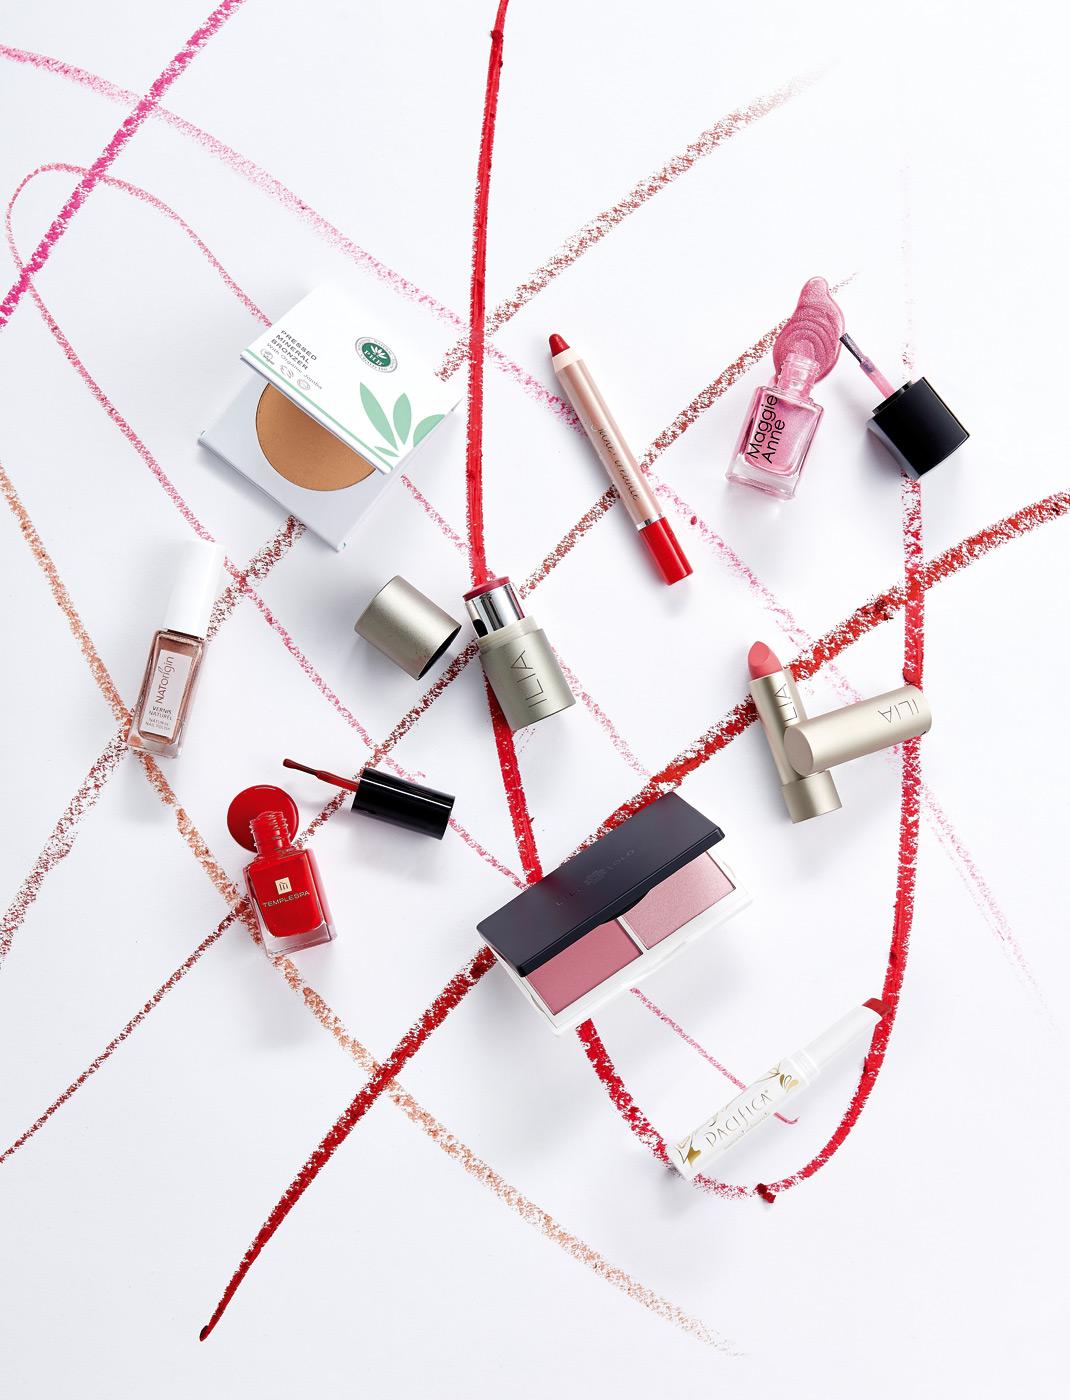 Lipstick product photography